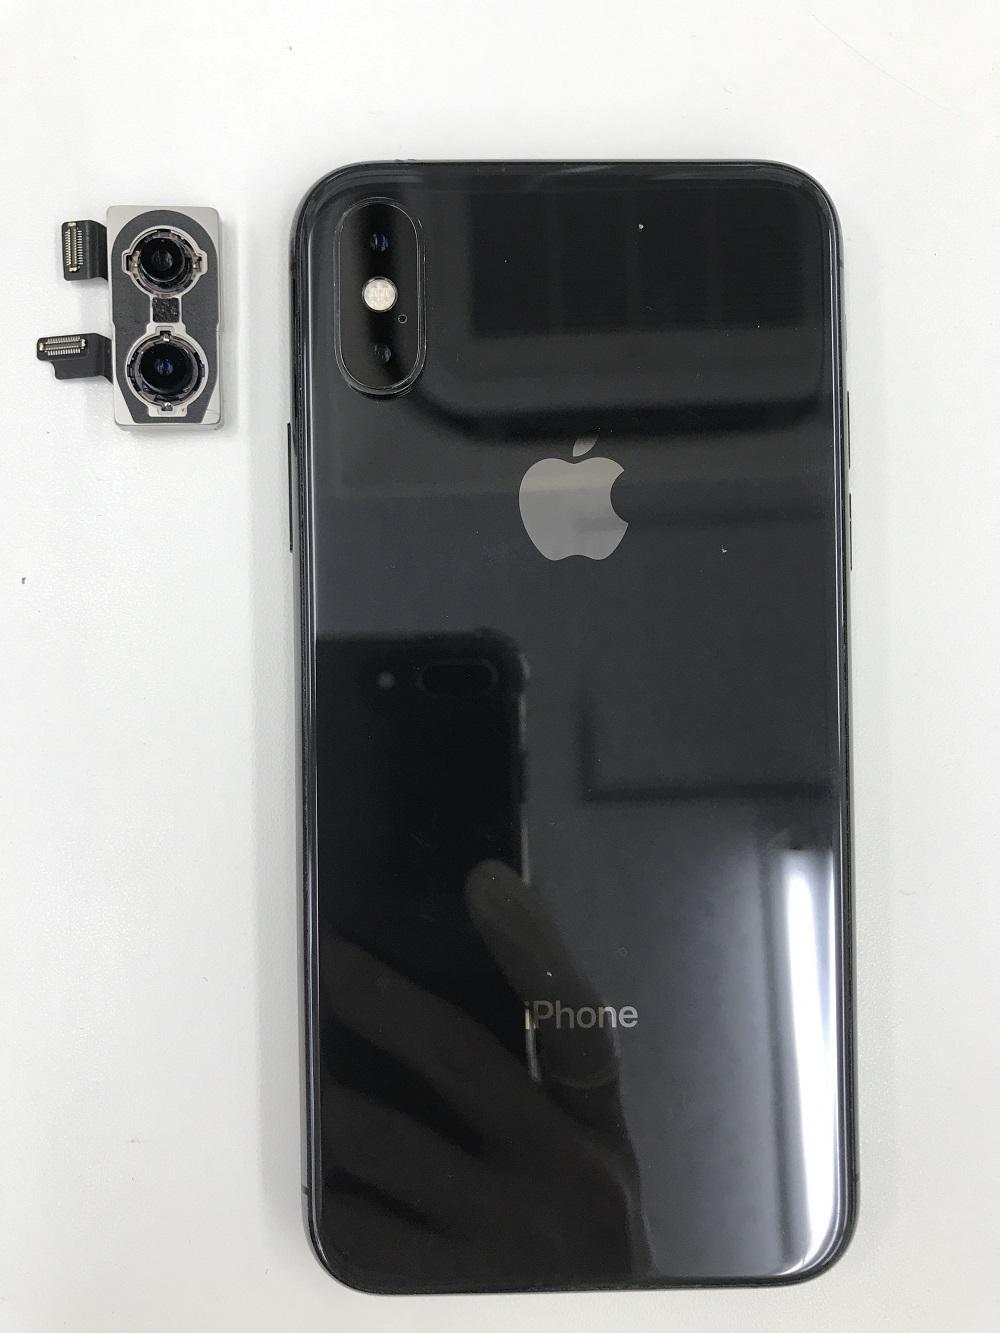 iPhone8Plusアウトカメラ交換 写真